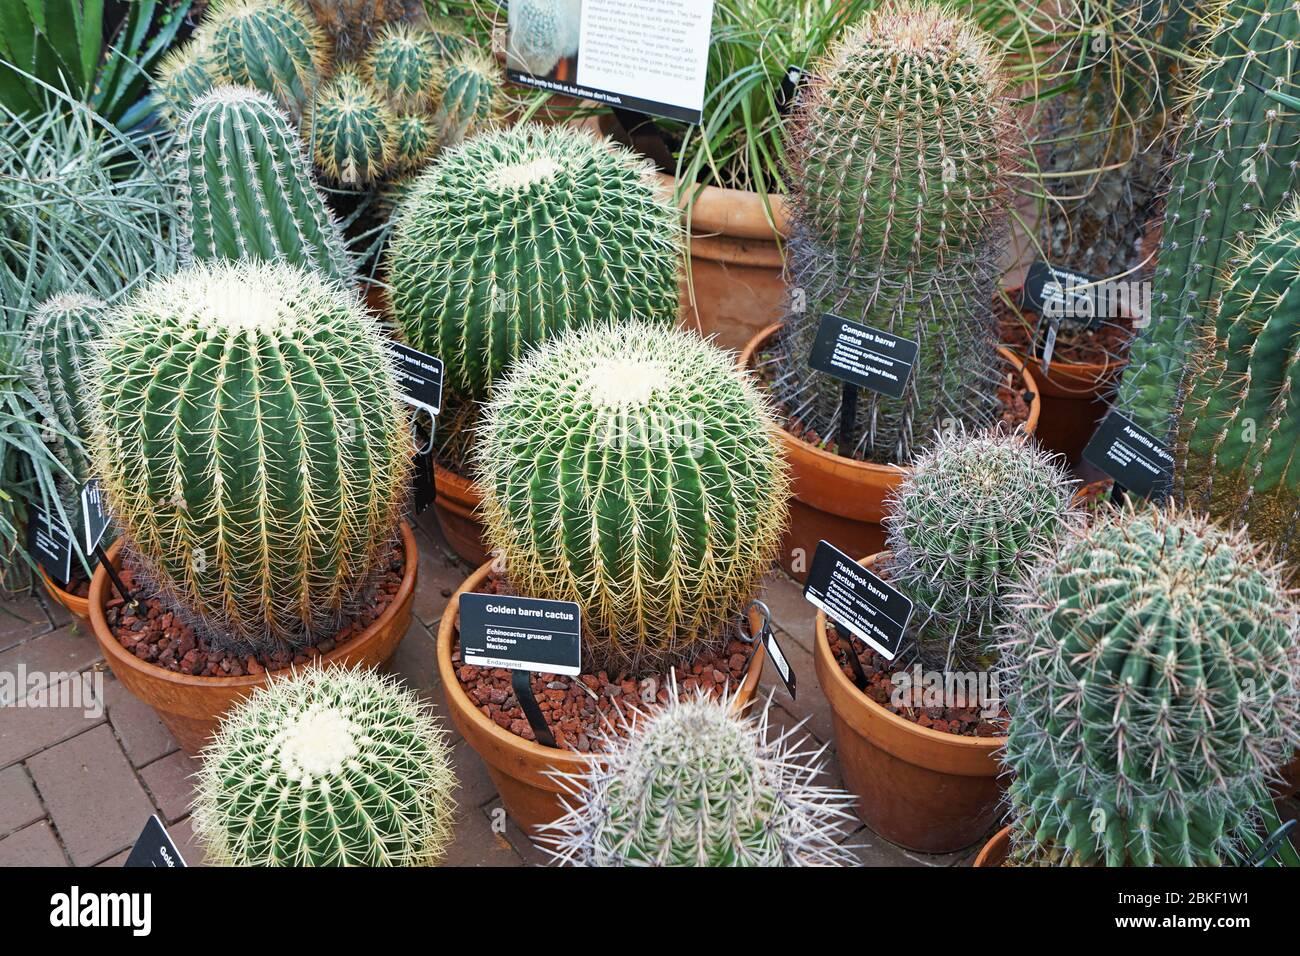 Arrangement Of Cactus Plant In Clay Pots Stock Photo Alamy